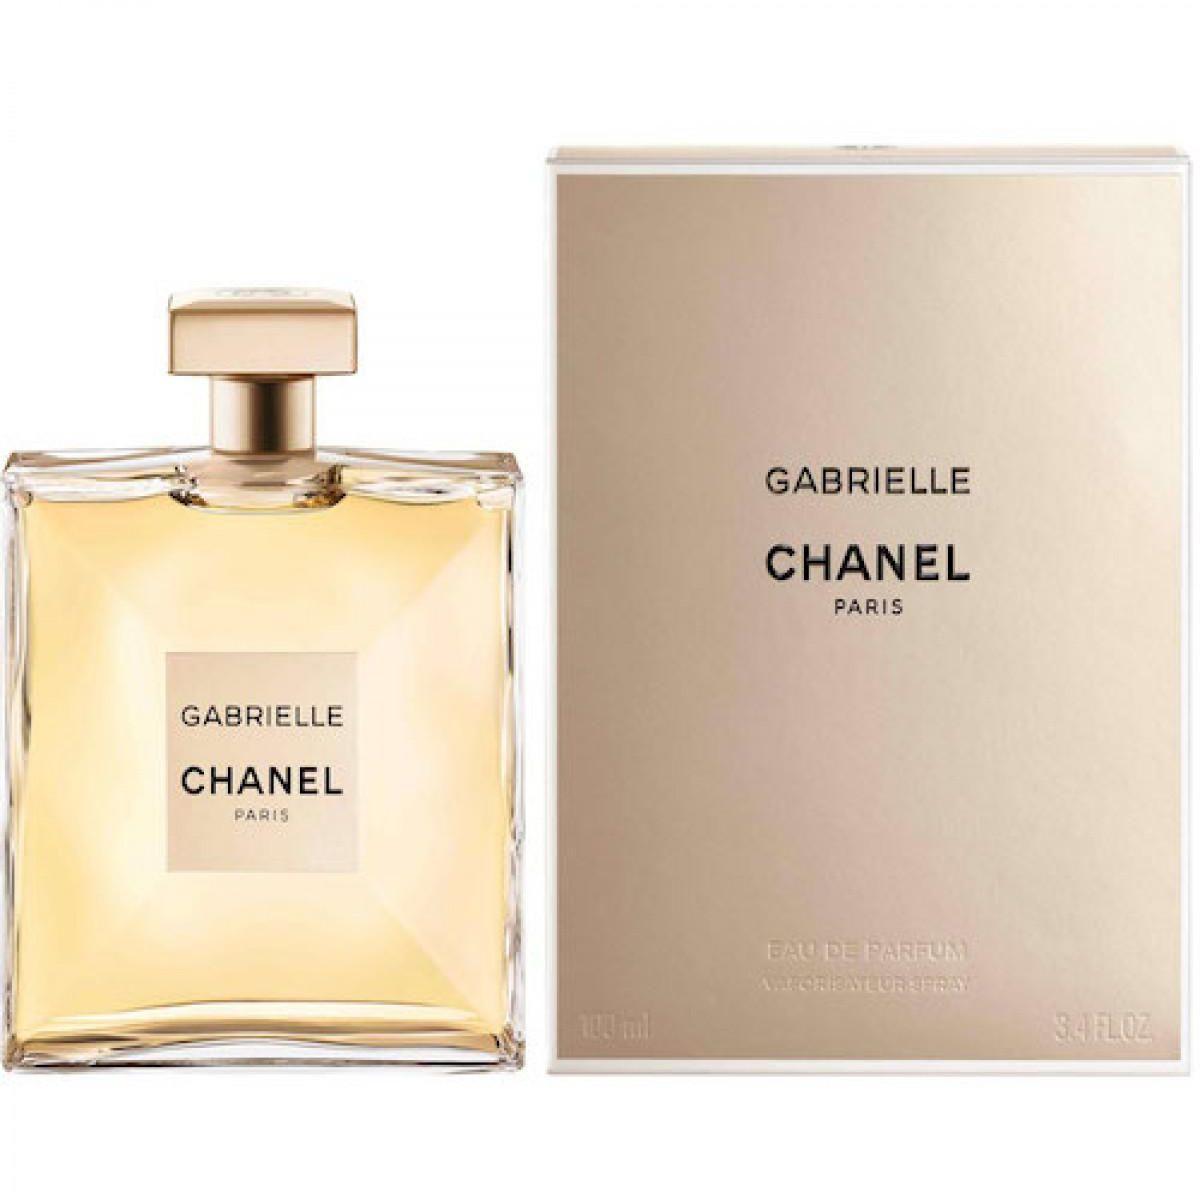 Latest Chanel Fragrances Products Enjoy Huge Discounts Lazada Sg Bleu Men 150ml Gabrielle Edp 50ml